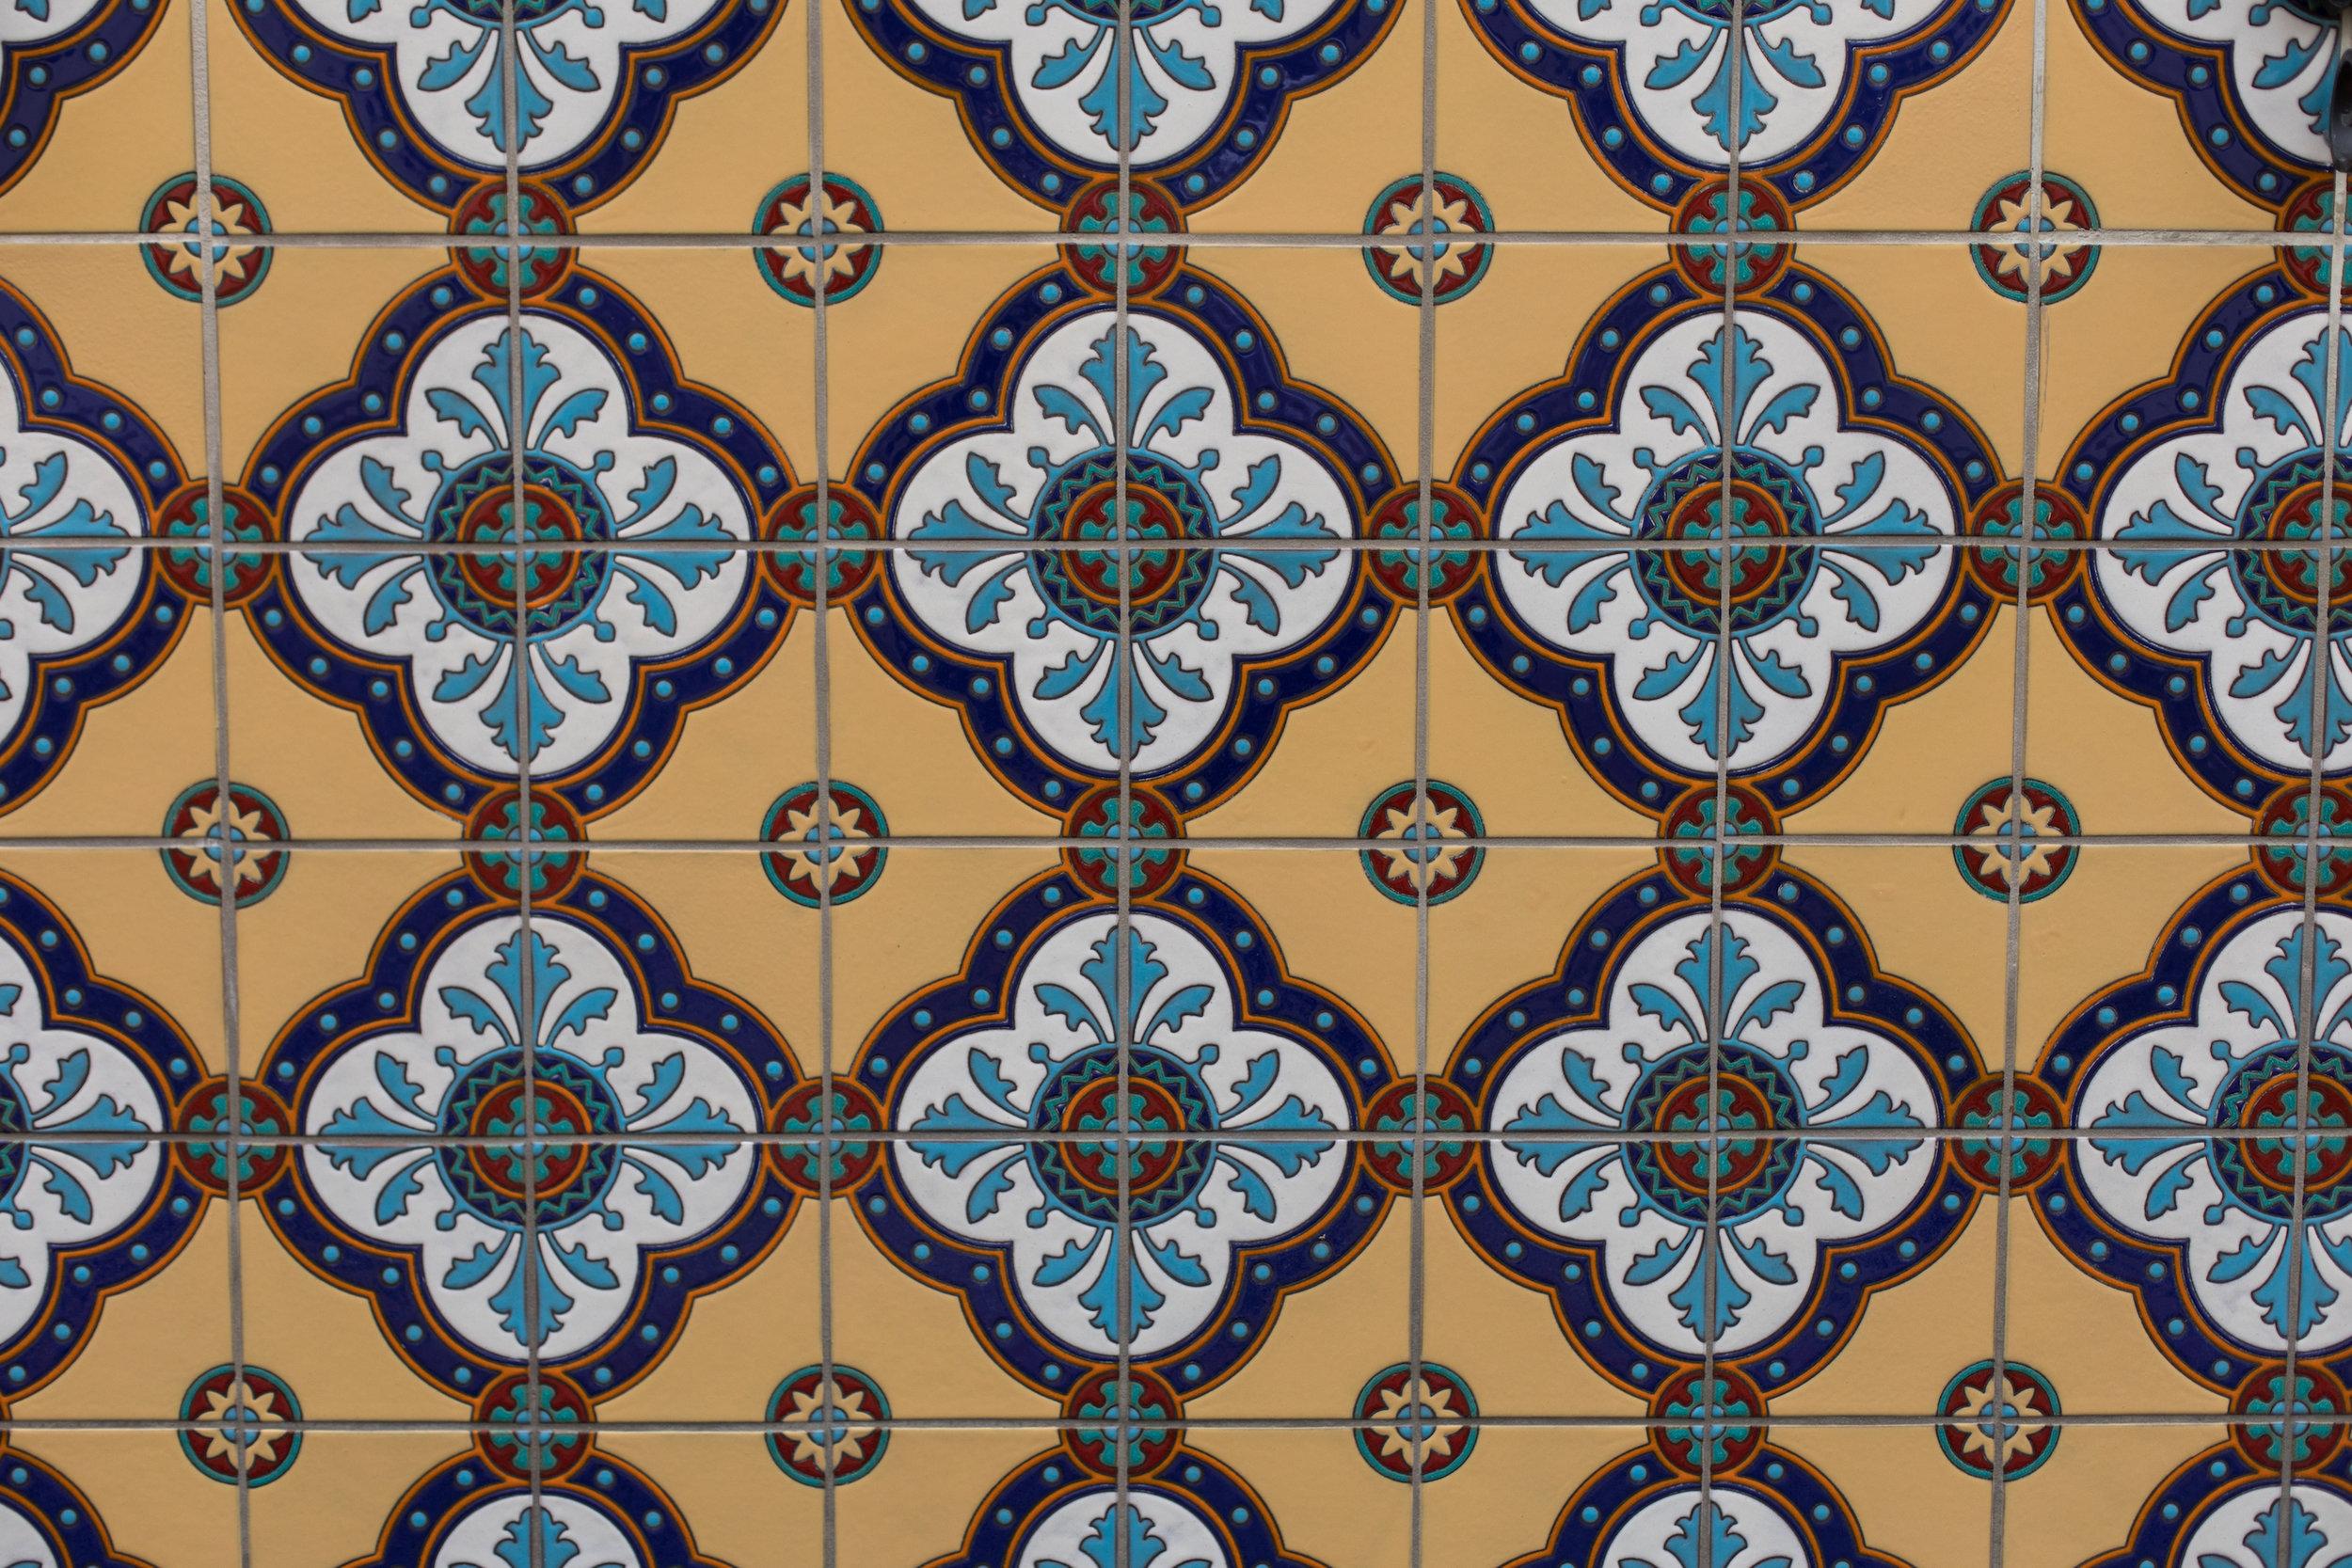 Hilltop Hacienda is an interior design project by Denise Morrison Interiors featuring custom decorative tile.